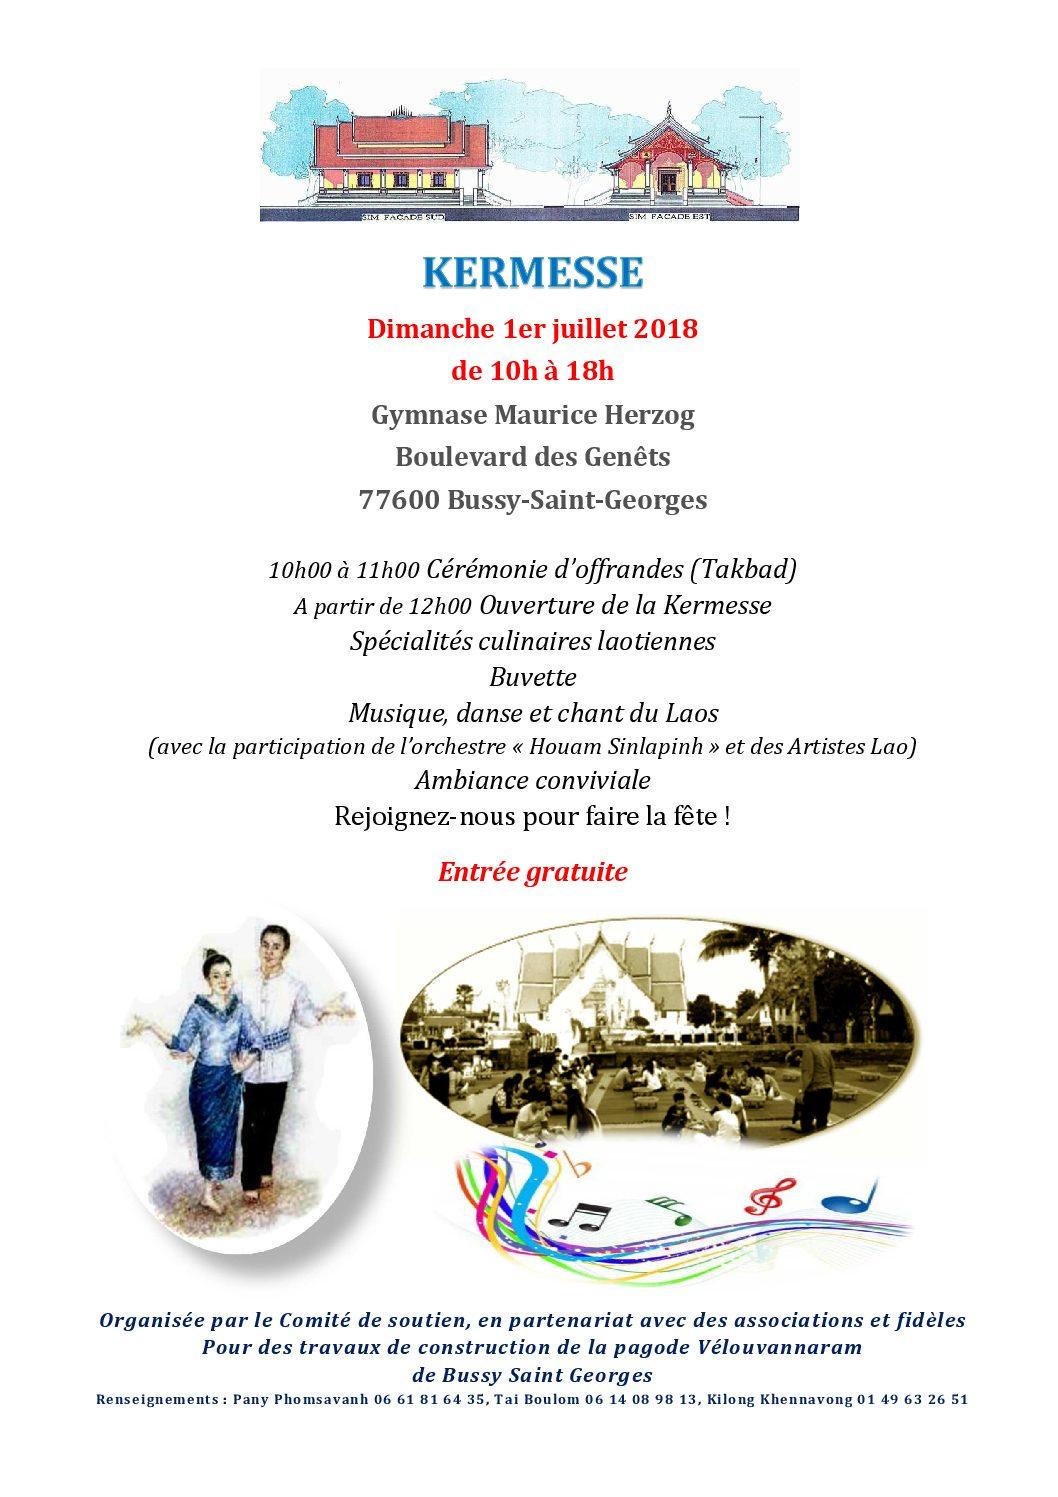 Kermesse 2018